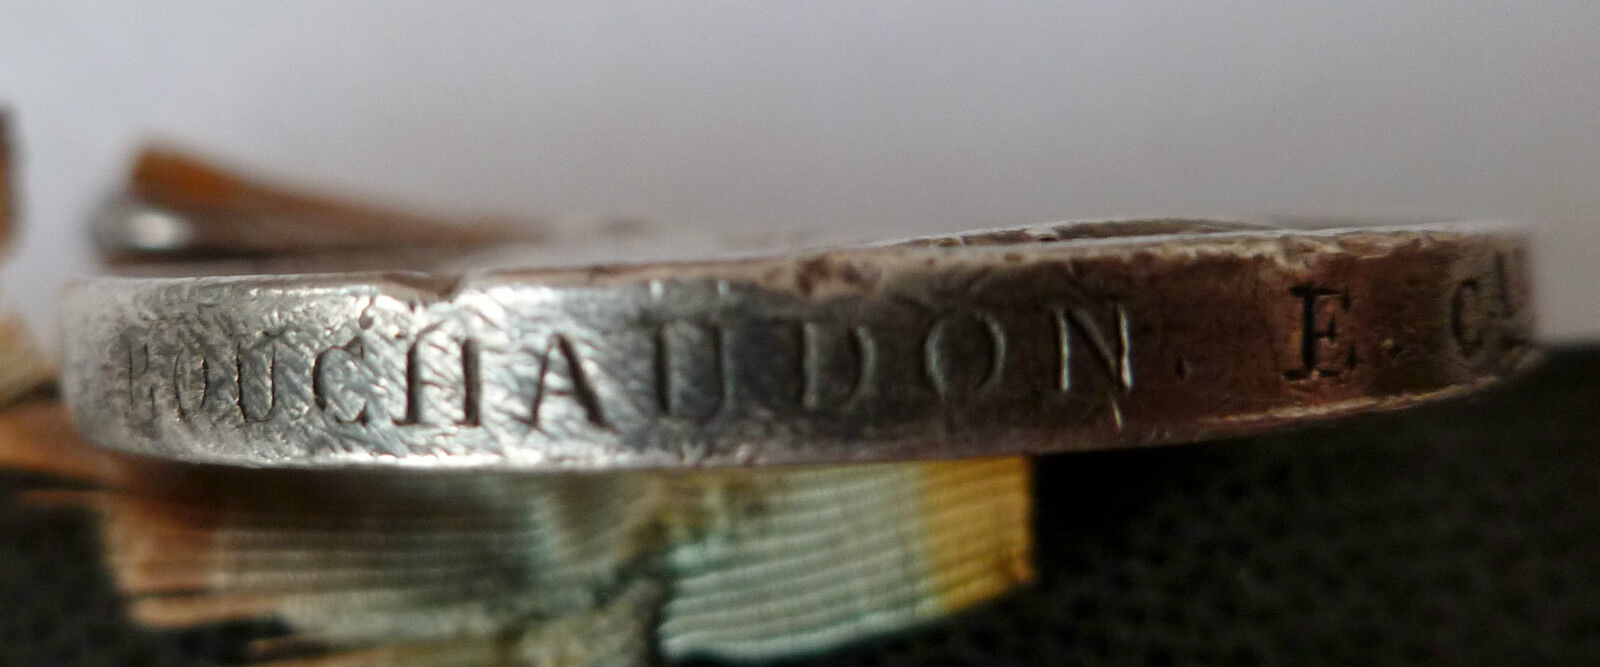 Medaille de crimee 1854 garde imperiale attribu original crimea medal 2 empire - Paypal remboursement frais de port ...